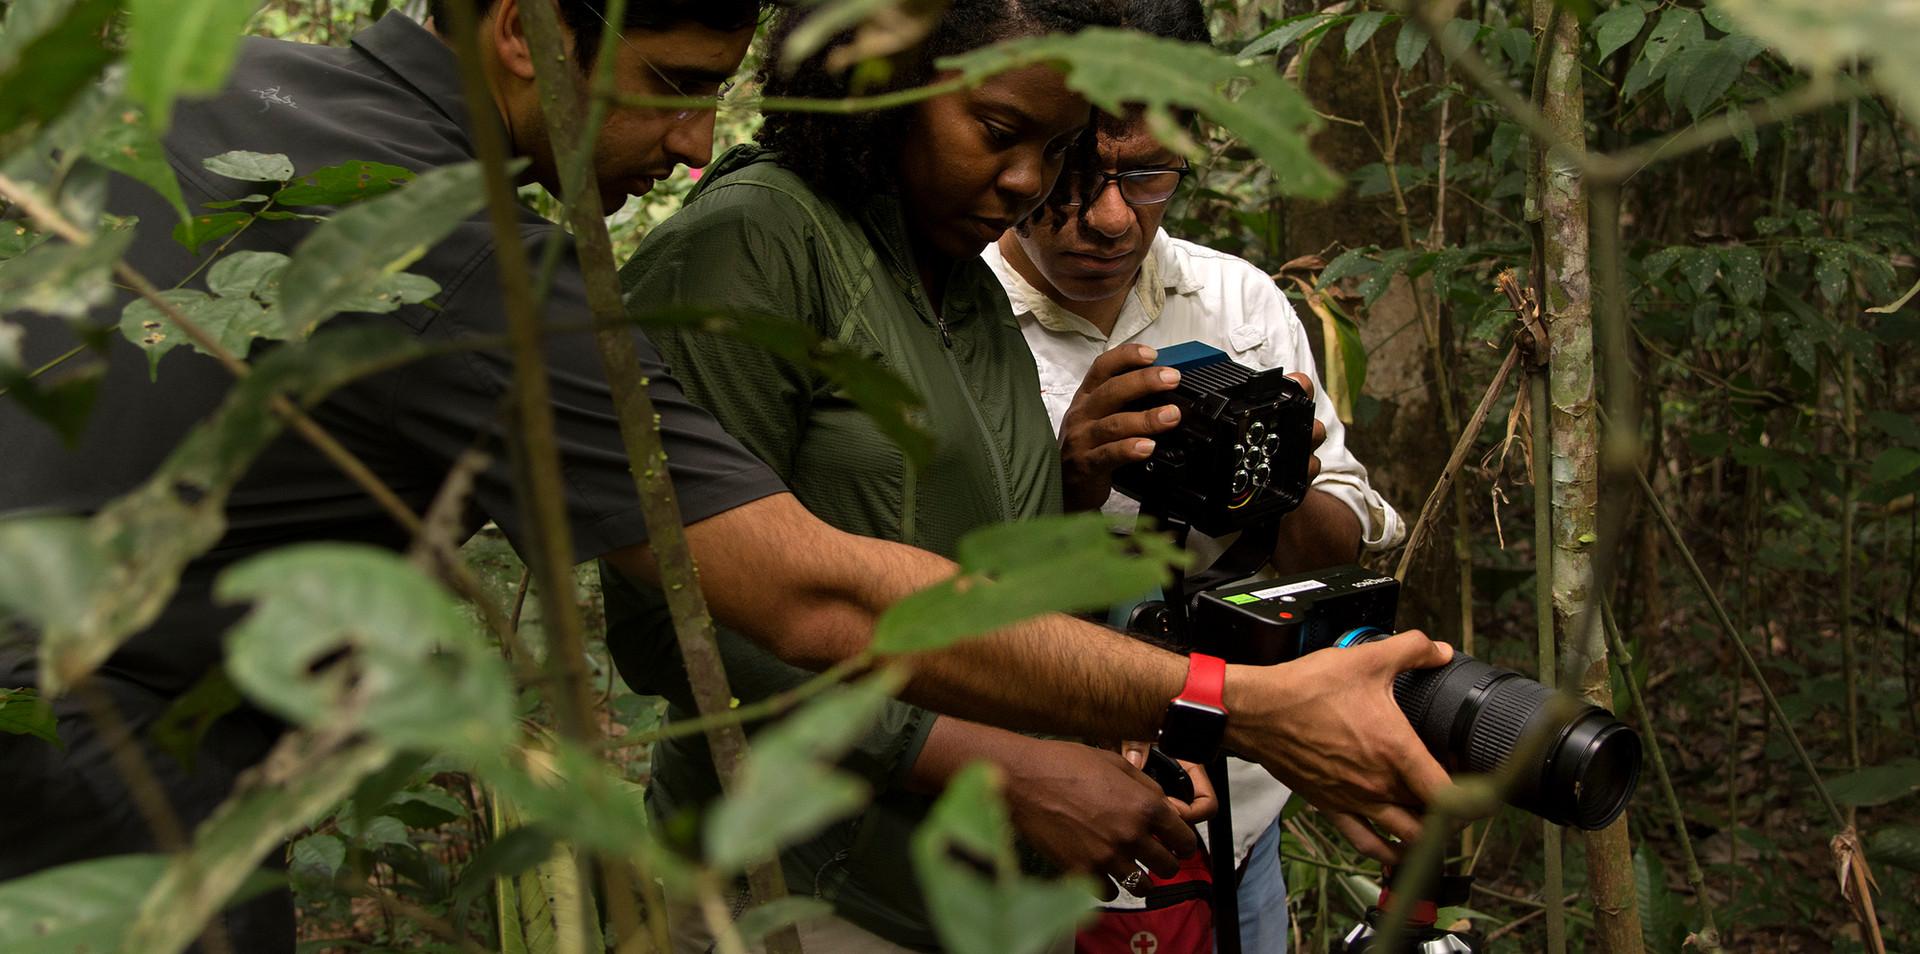 Filming spiders in the rainforest at Finca Las Piedras